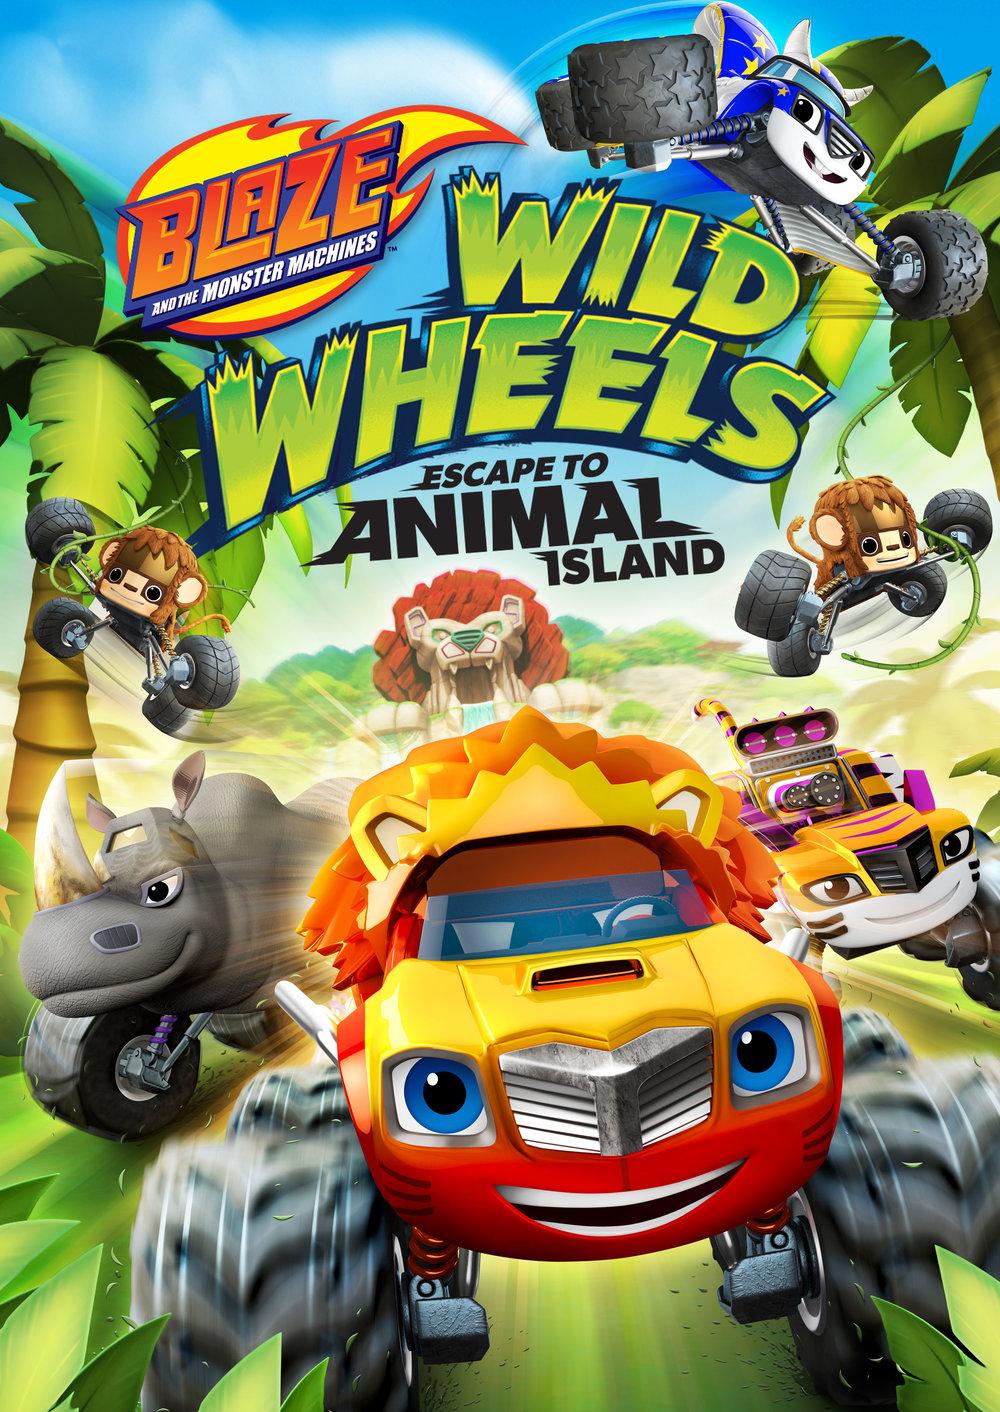 Blaze-&-the-Monster-Machines_Wild-Wheels.jpg